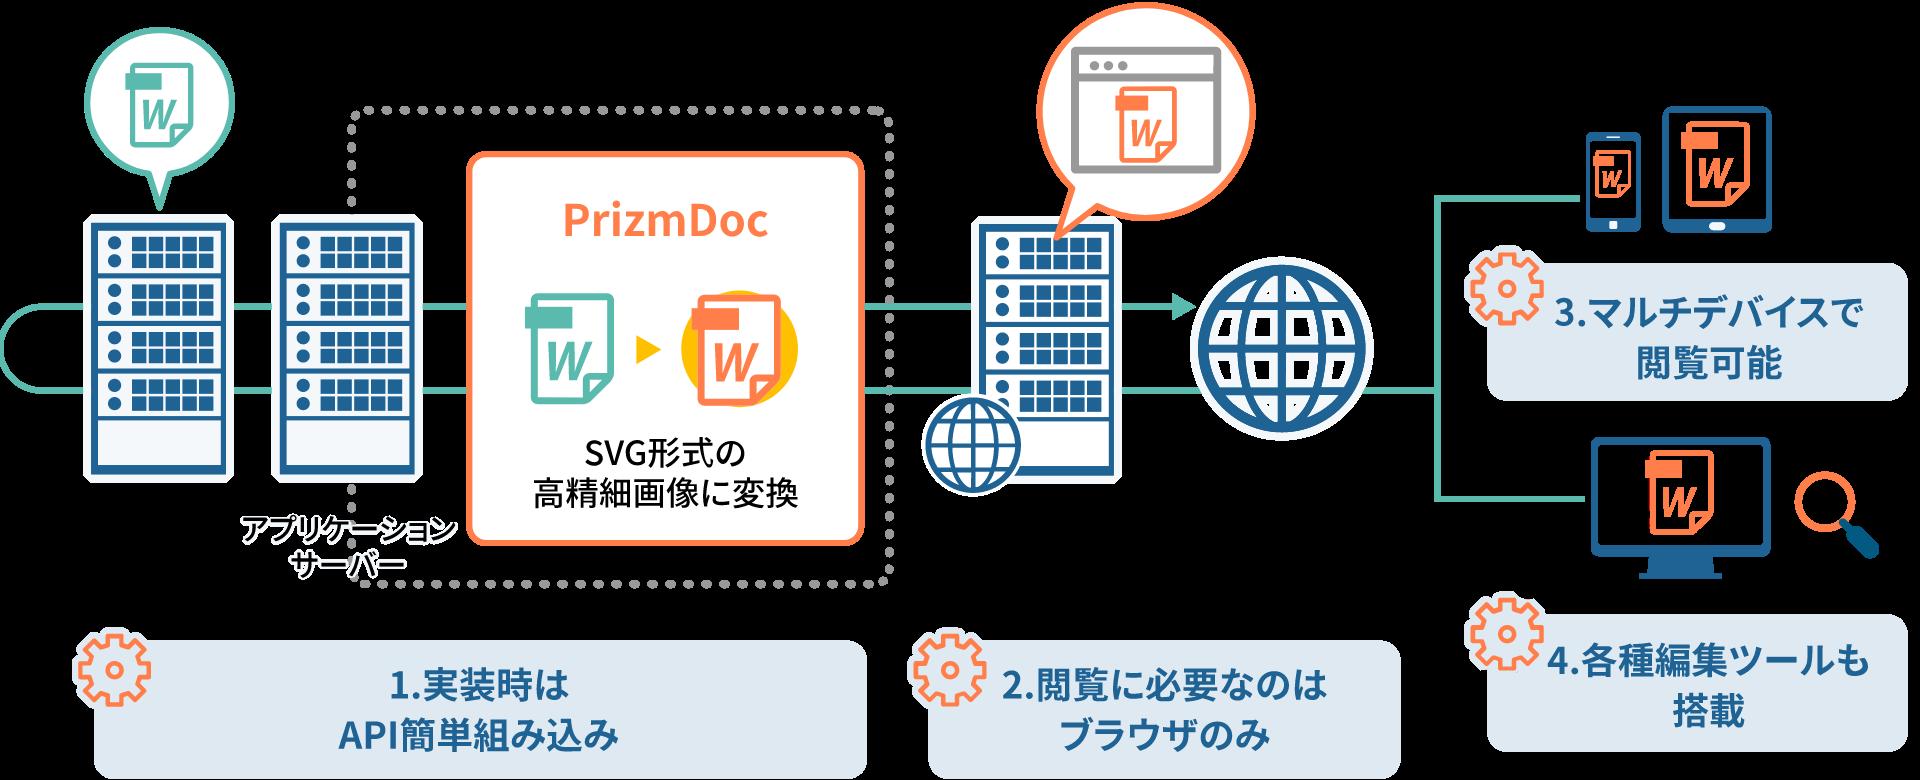 PrizmDoc のシステム構成 | 高機能ビューアを簡単実装